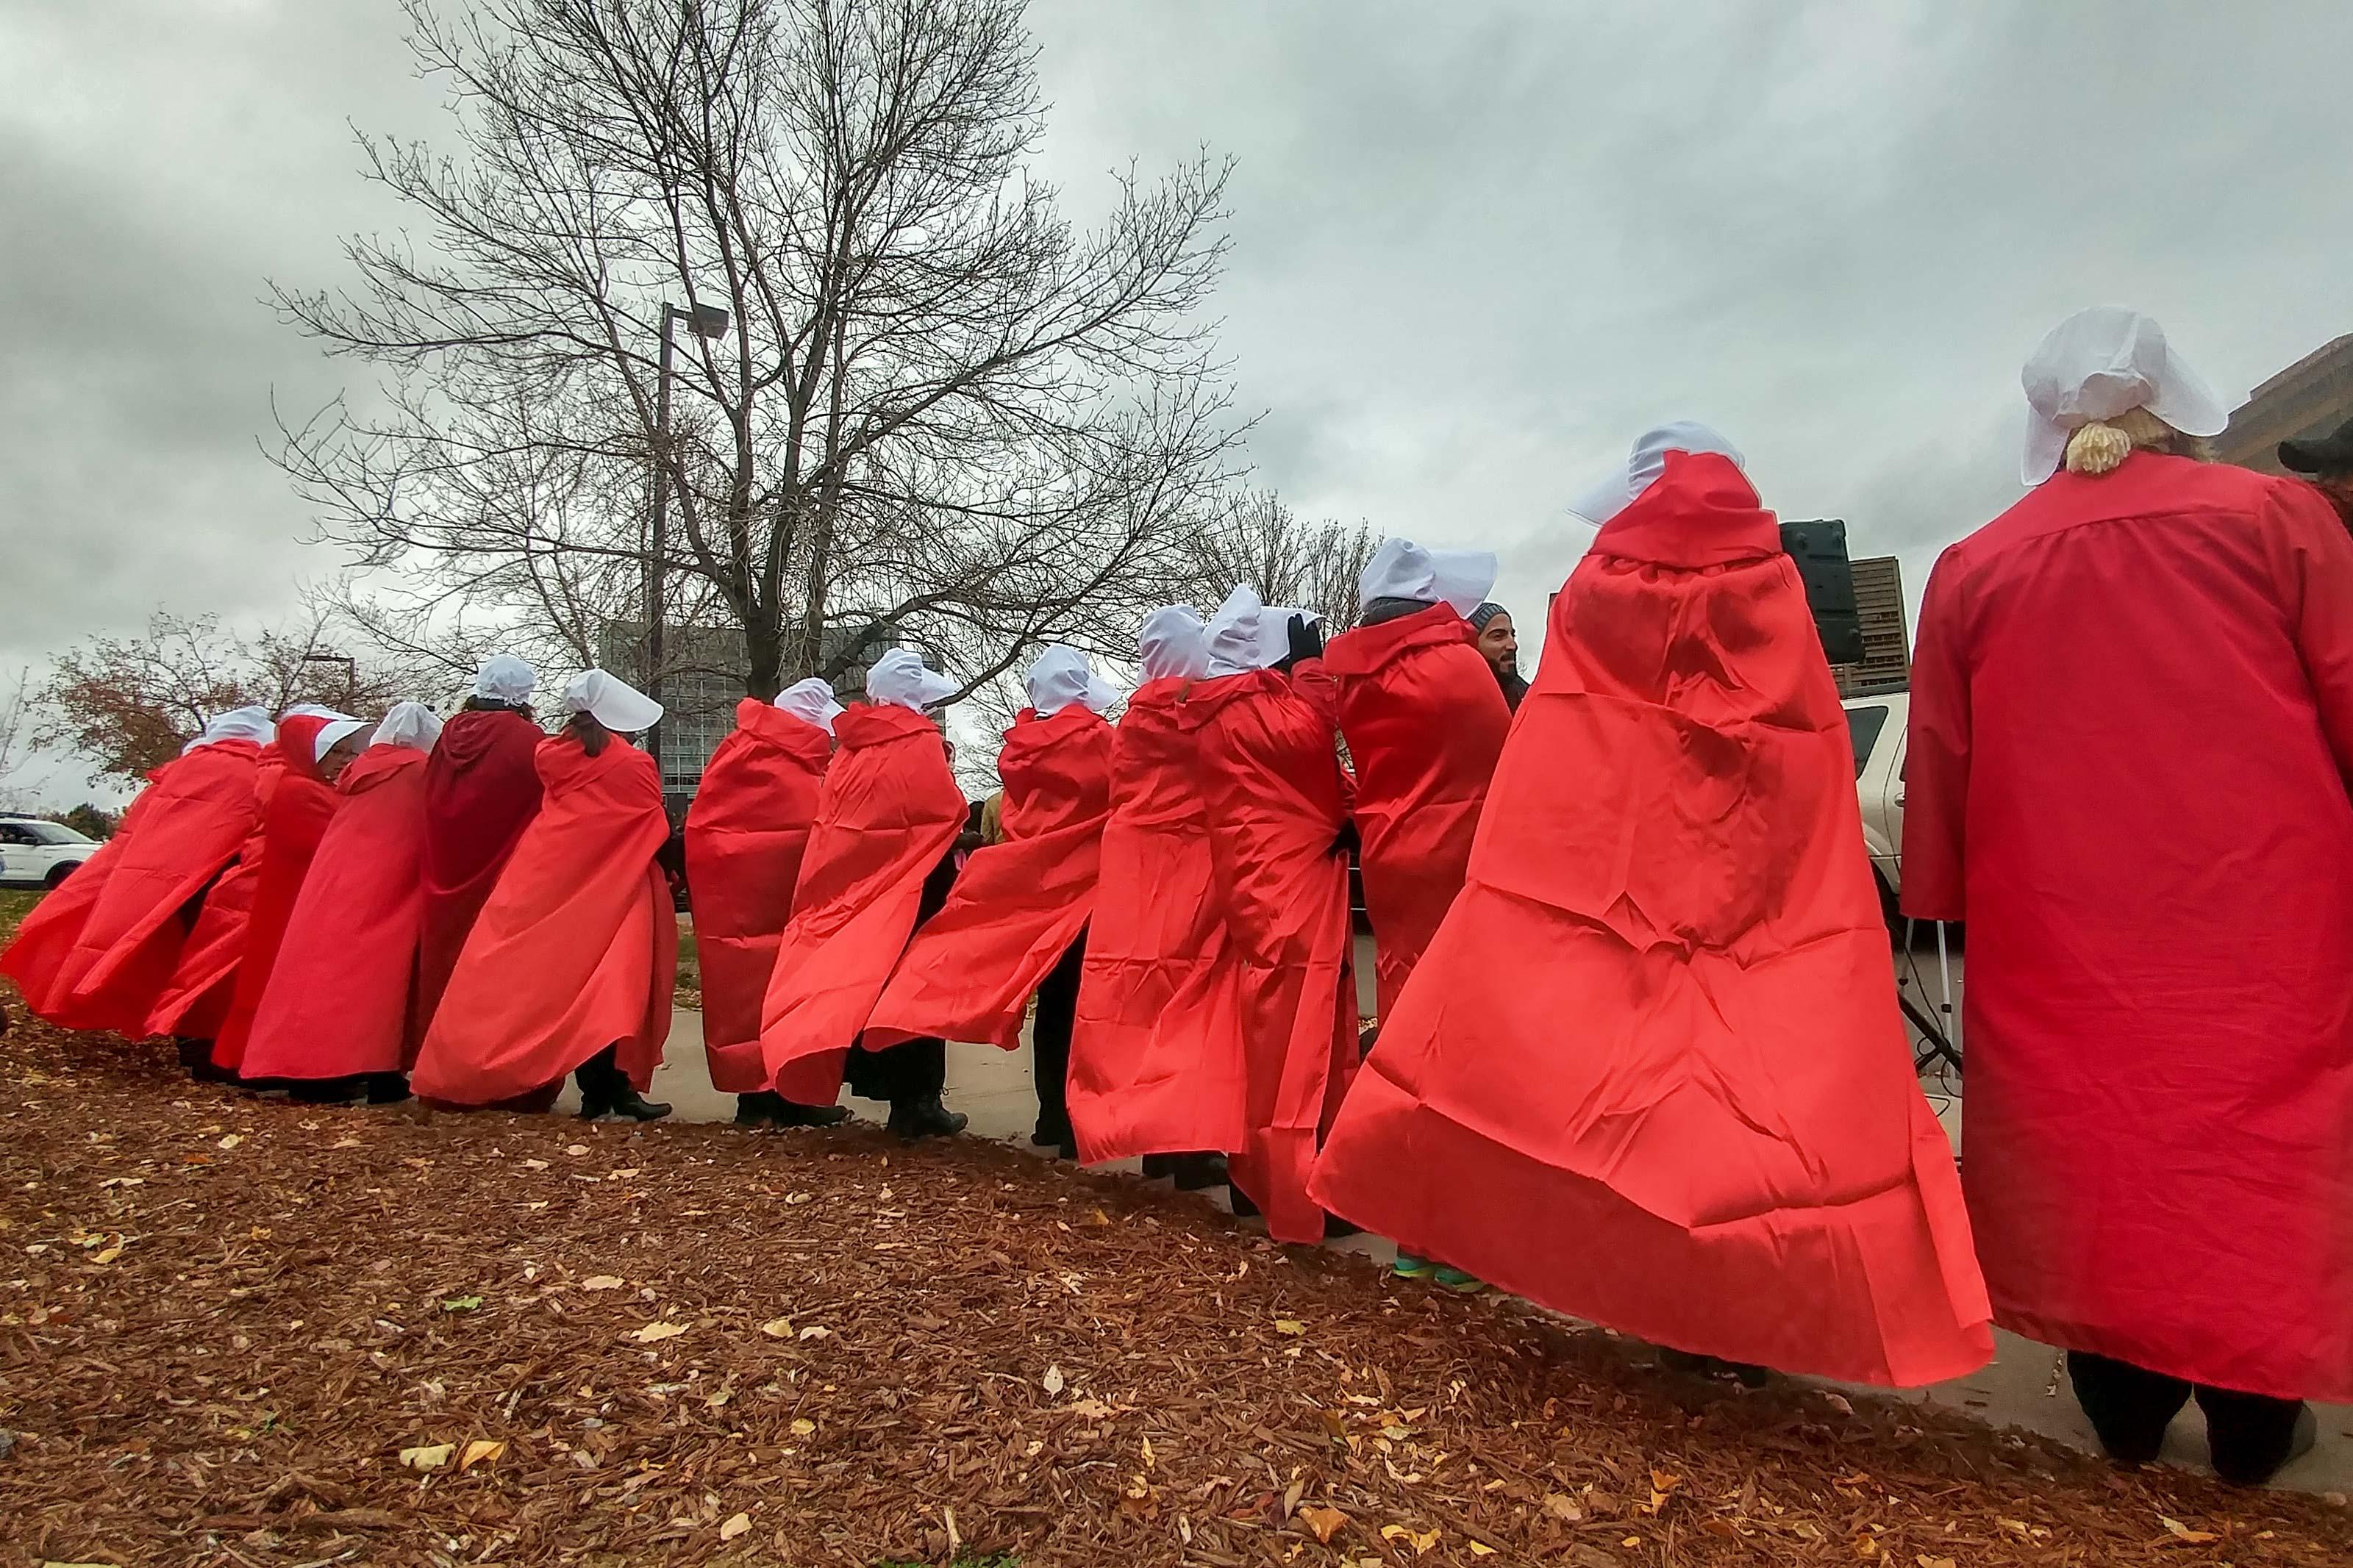 Photo: Mike Pence Colorado Visit 2 | Handmaid's Tale Protesters - XMcMahon